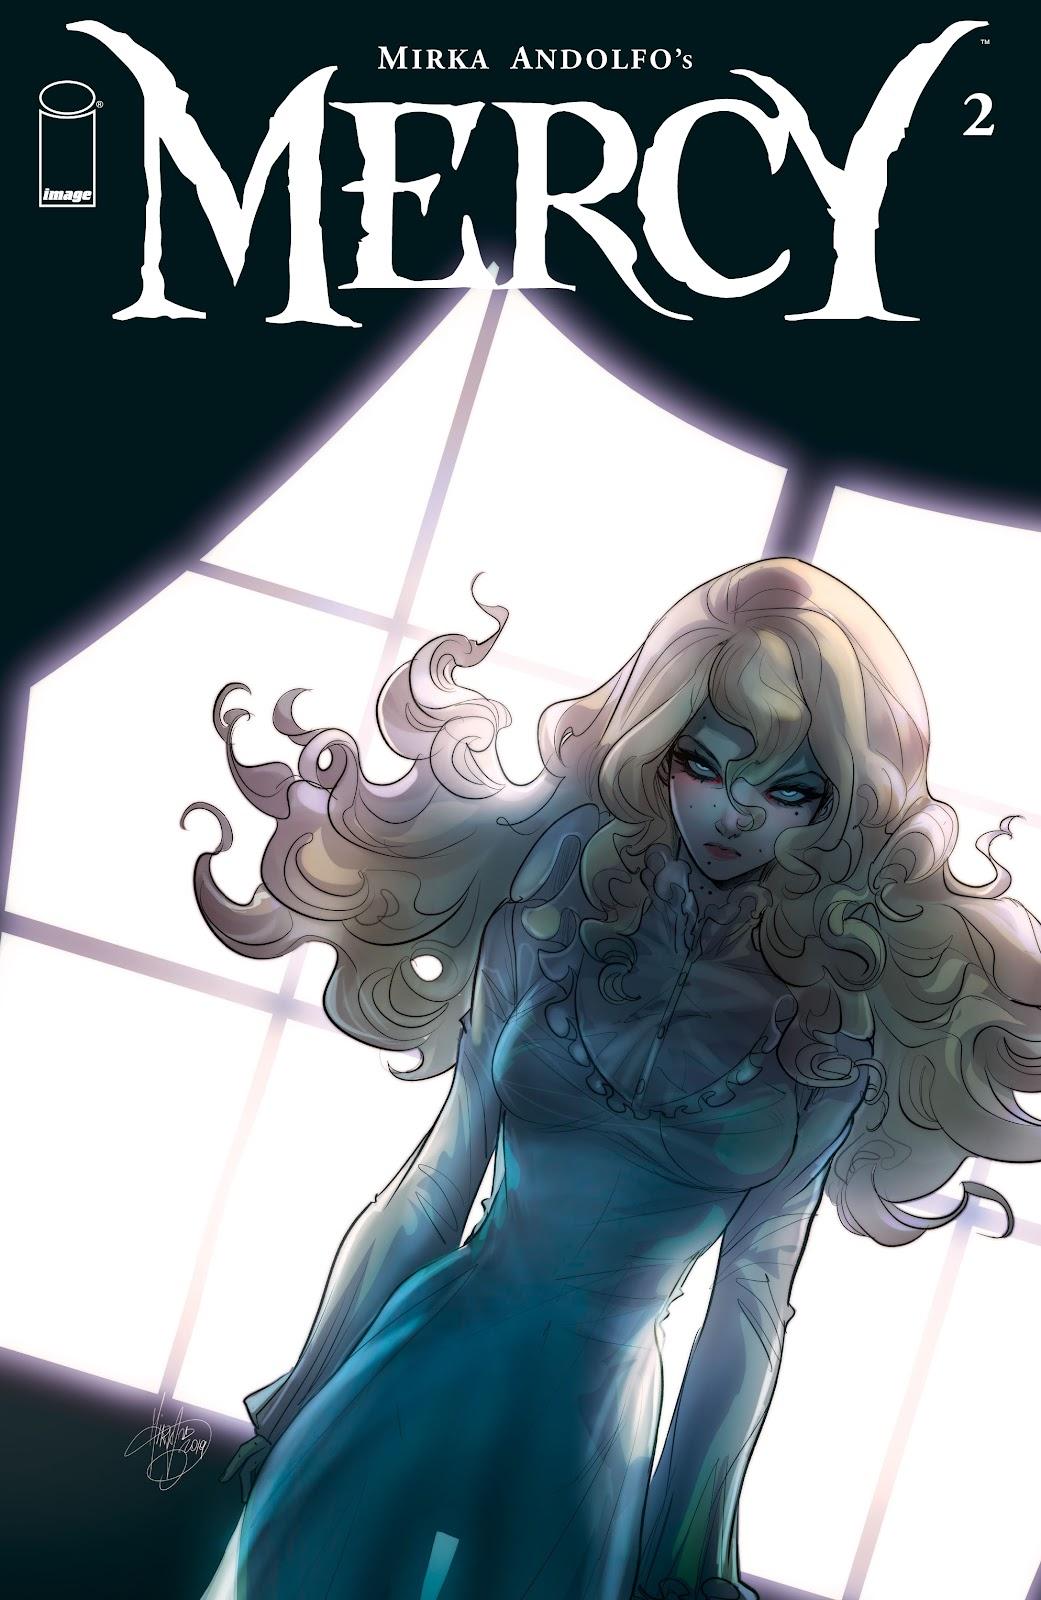 Read online Mirka Andolfo's Mercy comic -  Issue #2 - 1